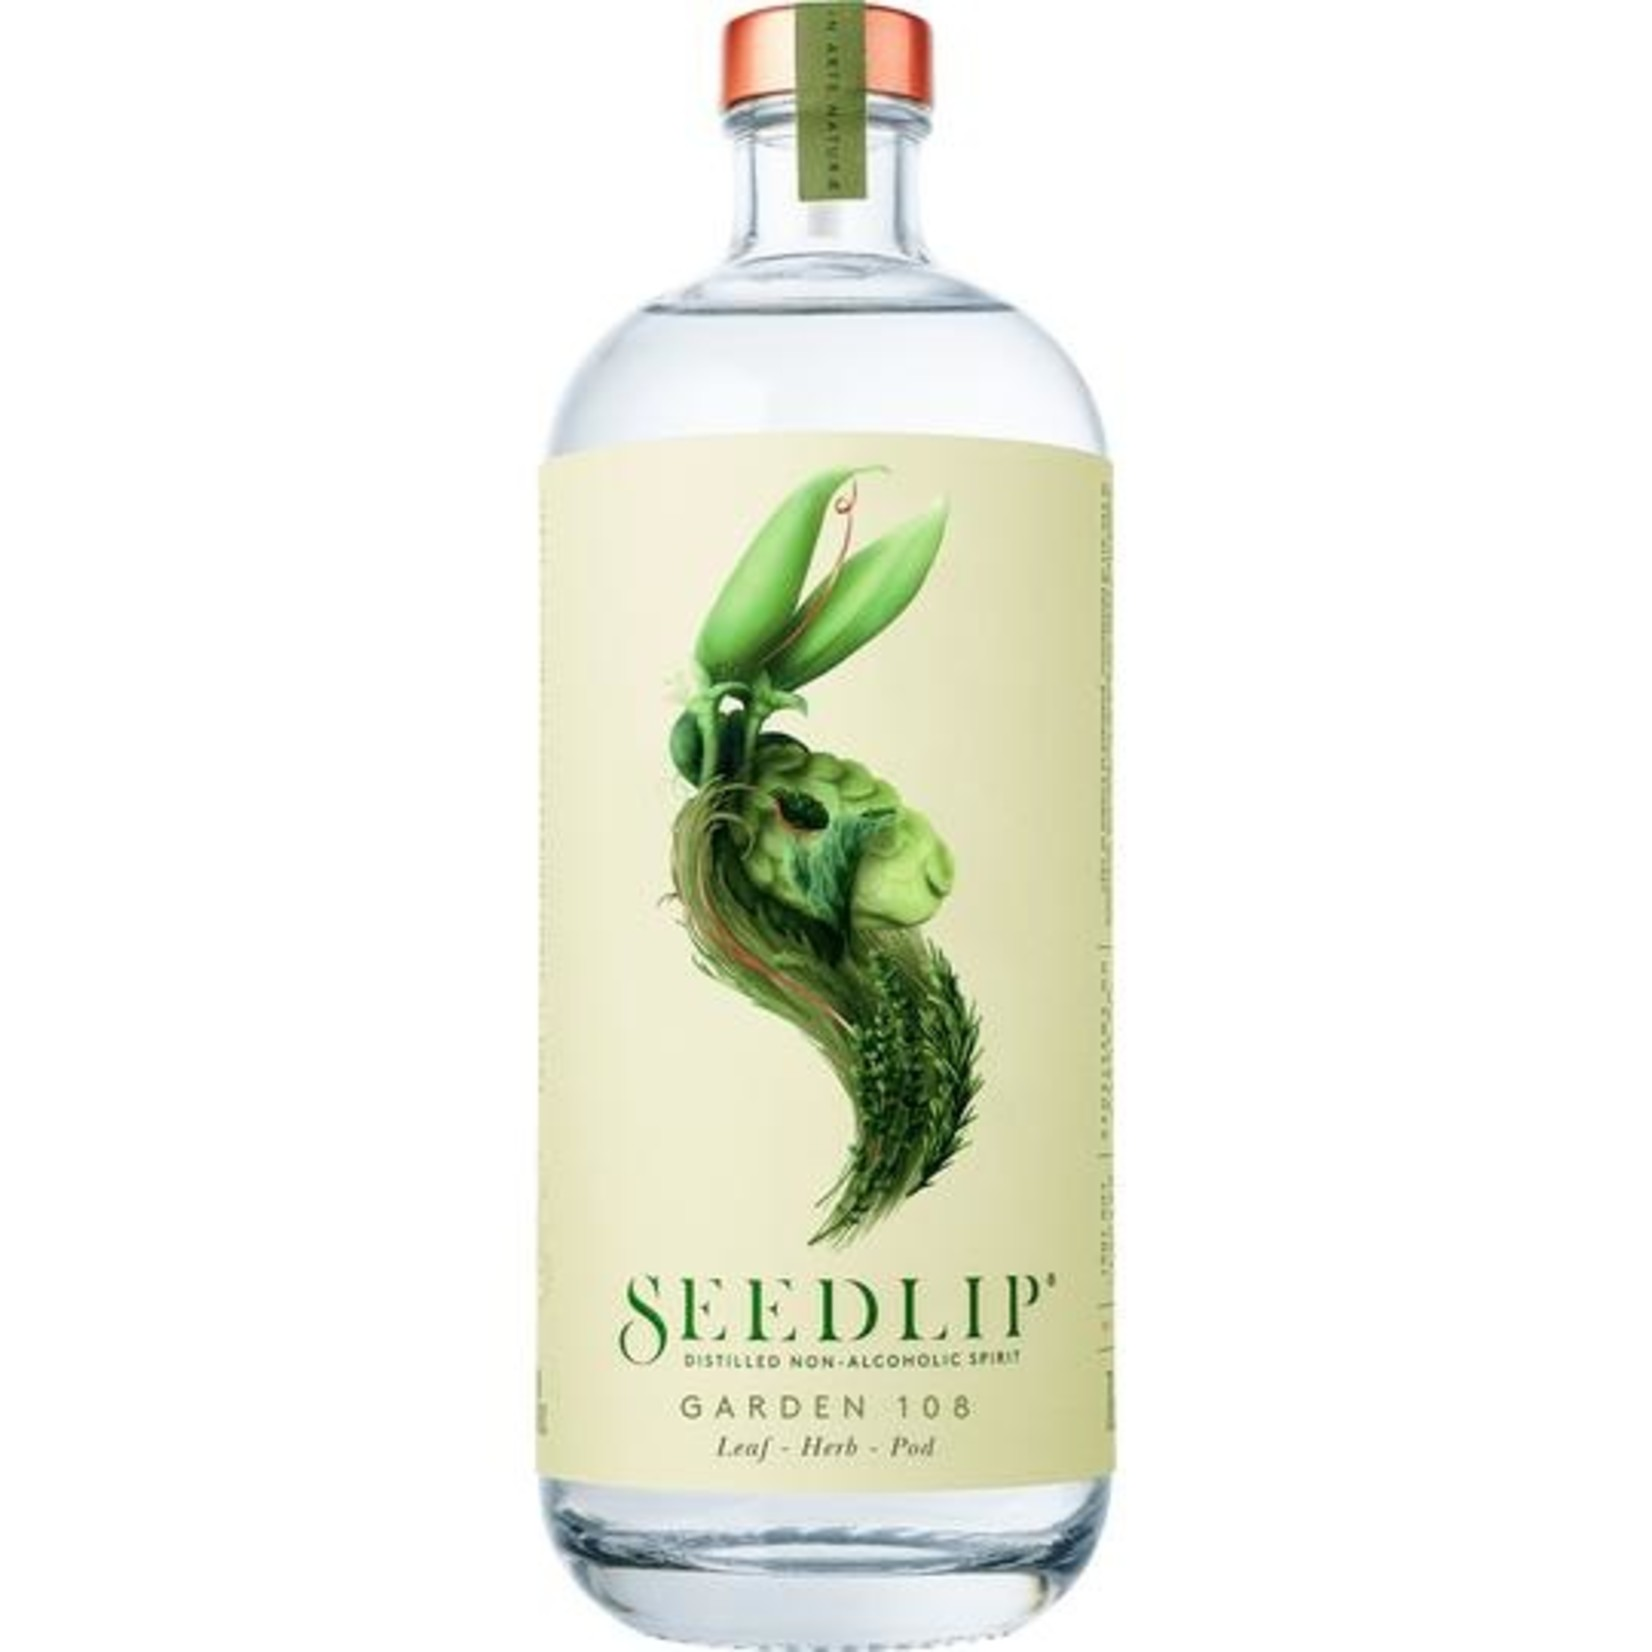 Seedlip Seedlip Garden 108 Non-Alcoholic 700ml